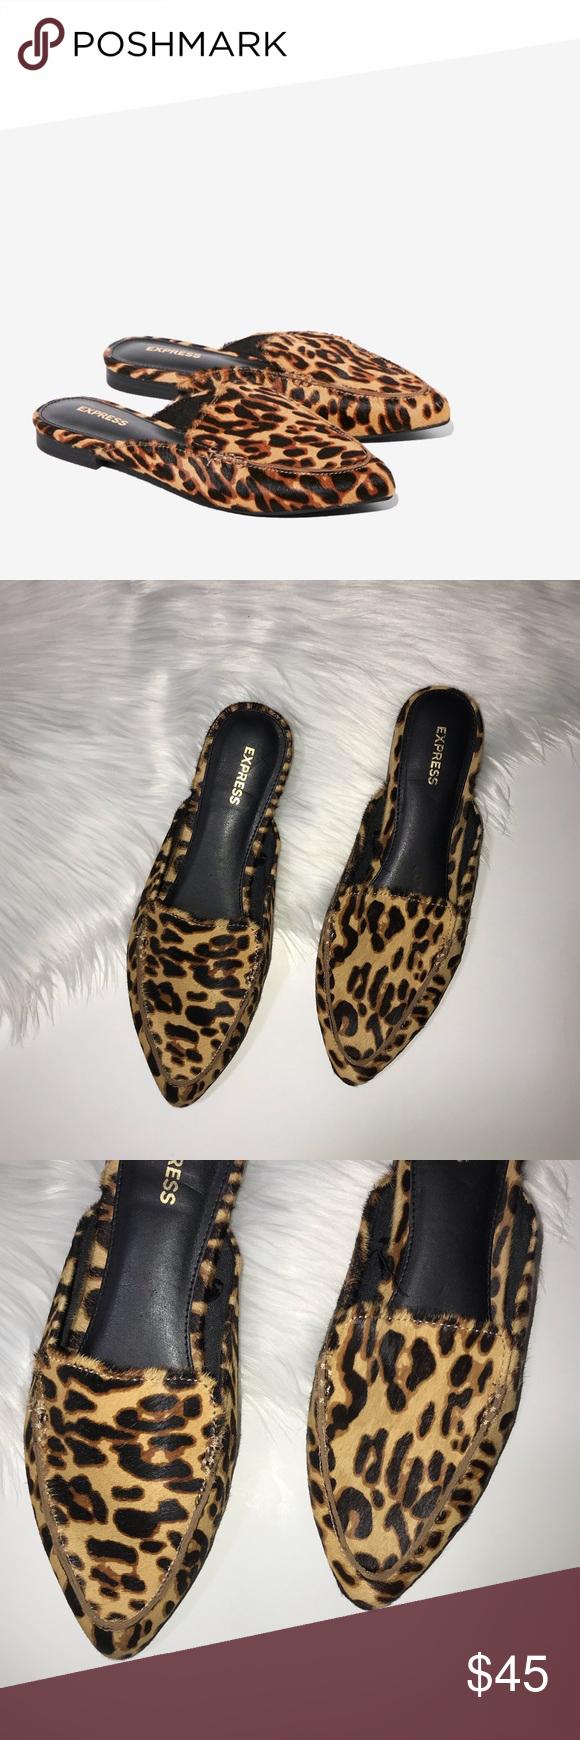 Express Leopard Calf Leather Print